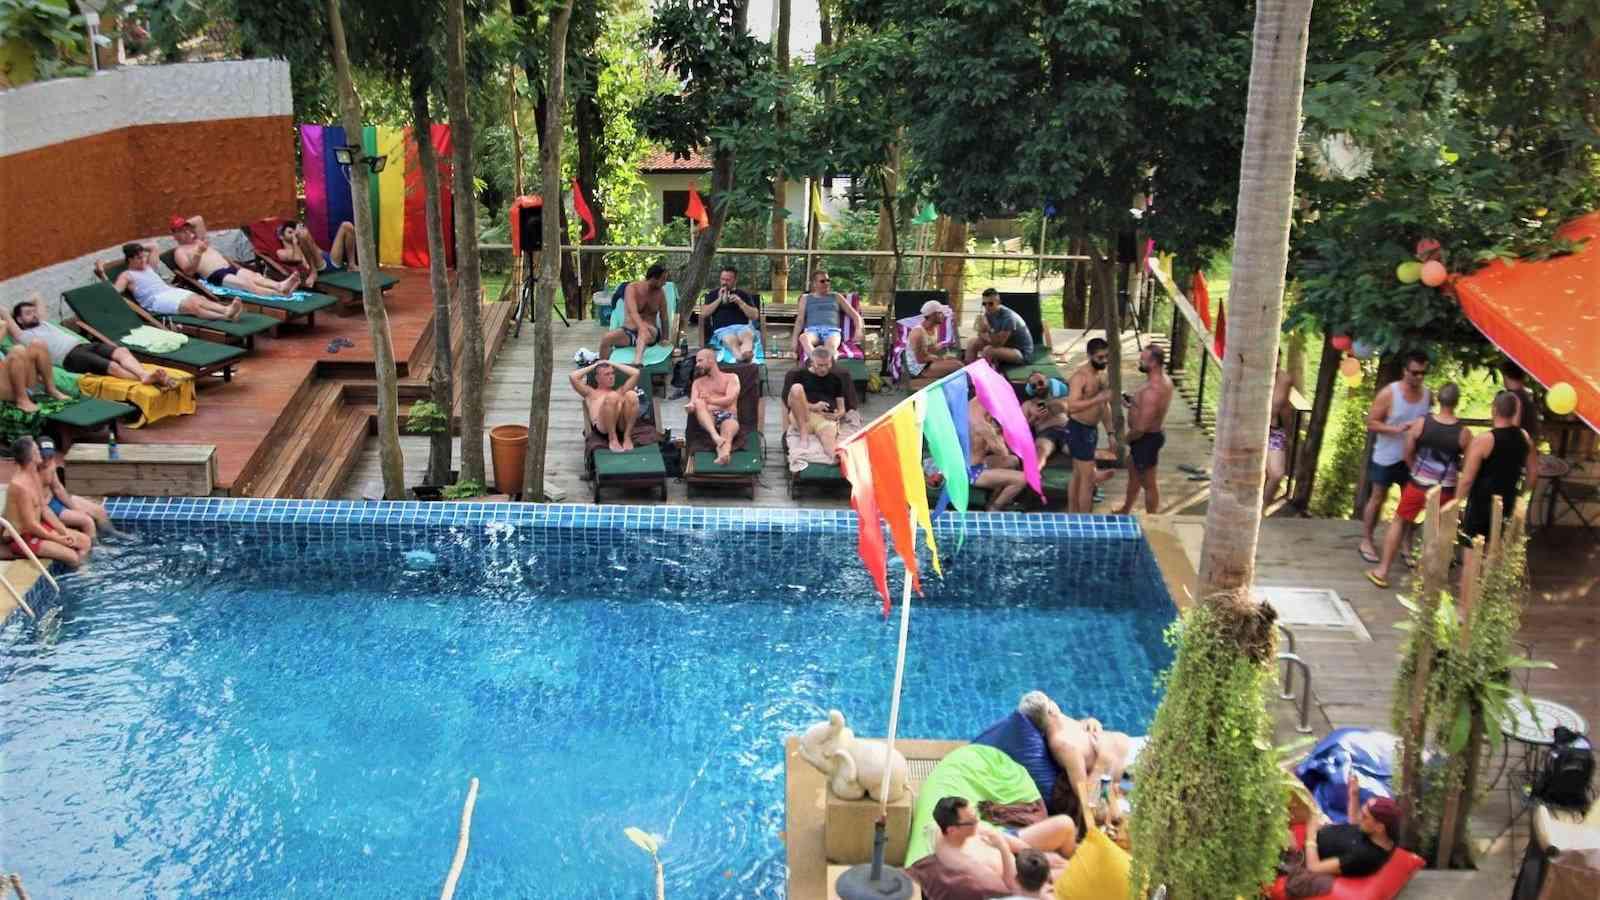 Koh Samui's Alpha Gay resort is the largest resort for gay men in Thailand